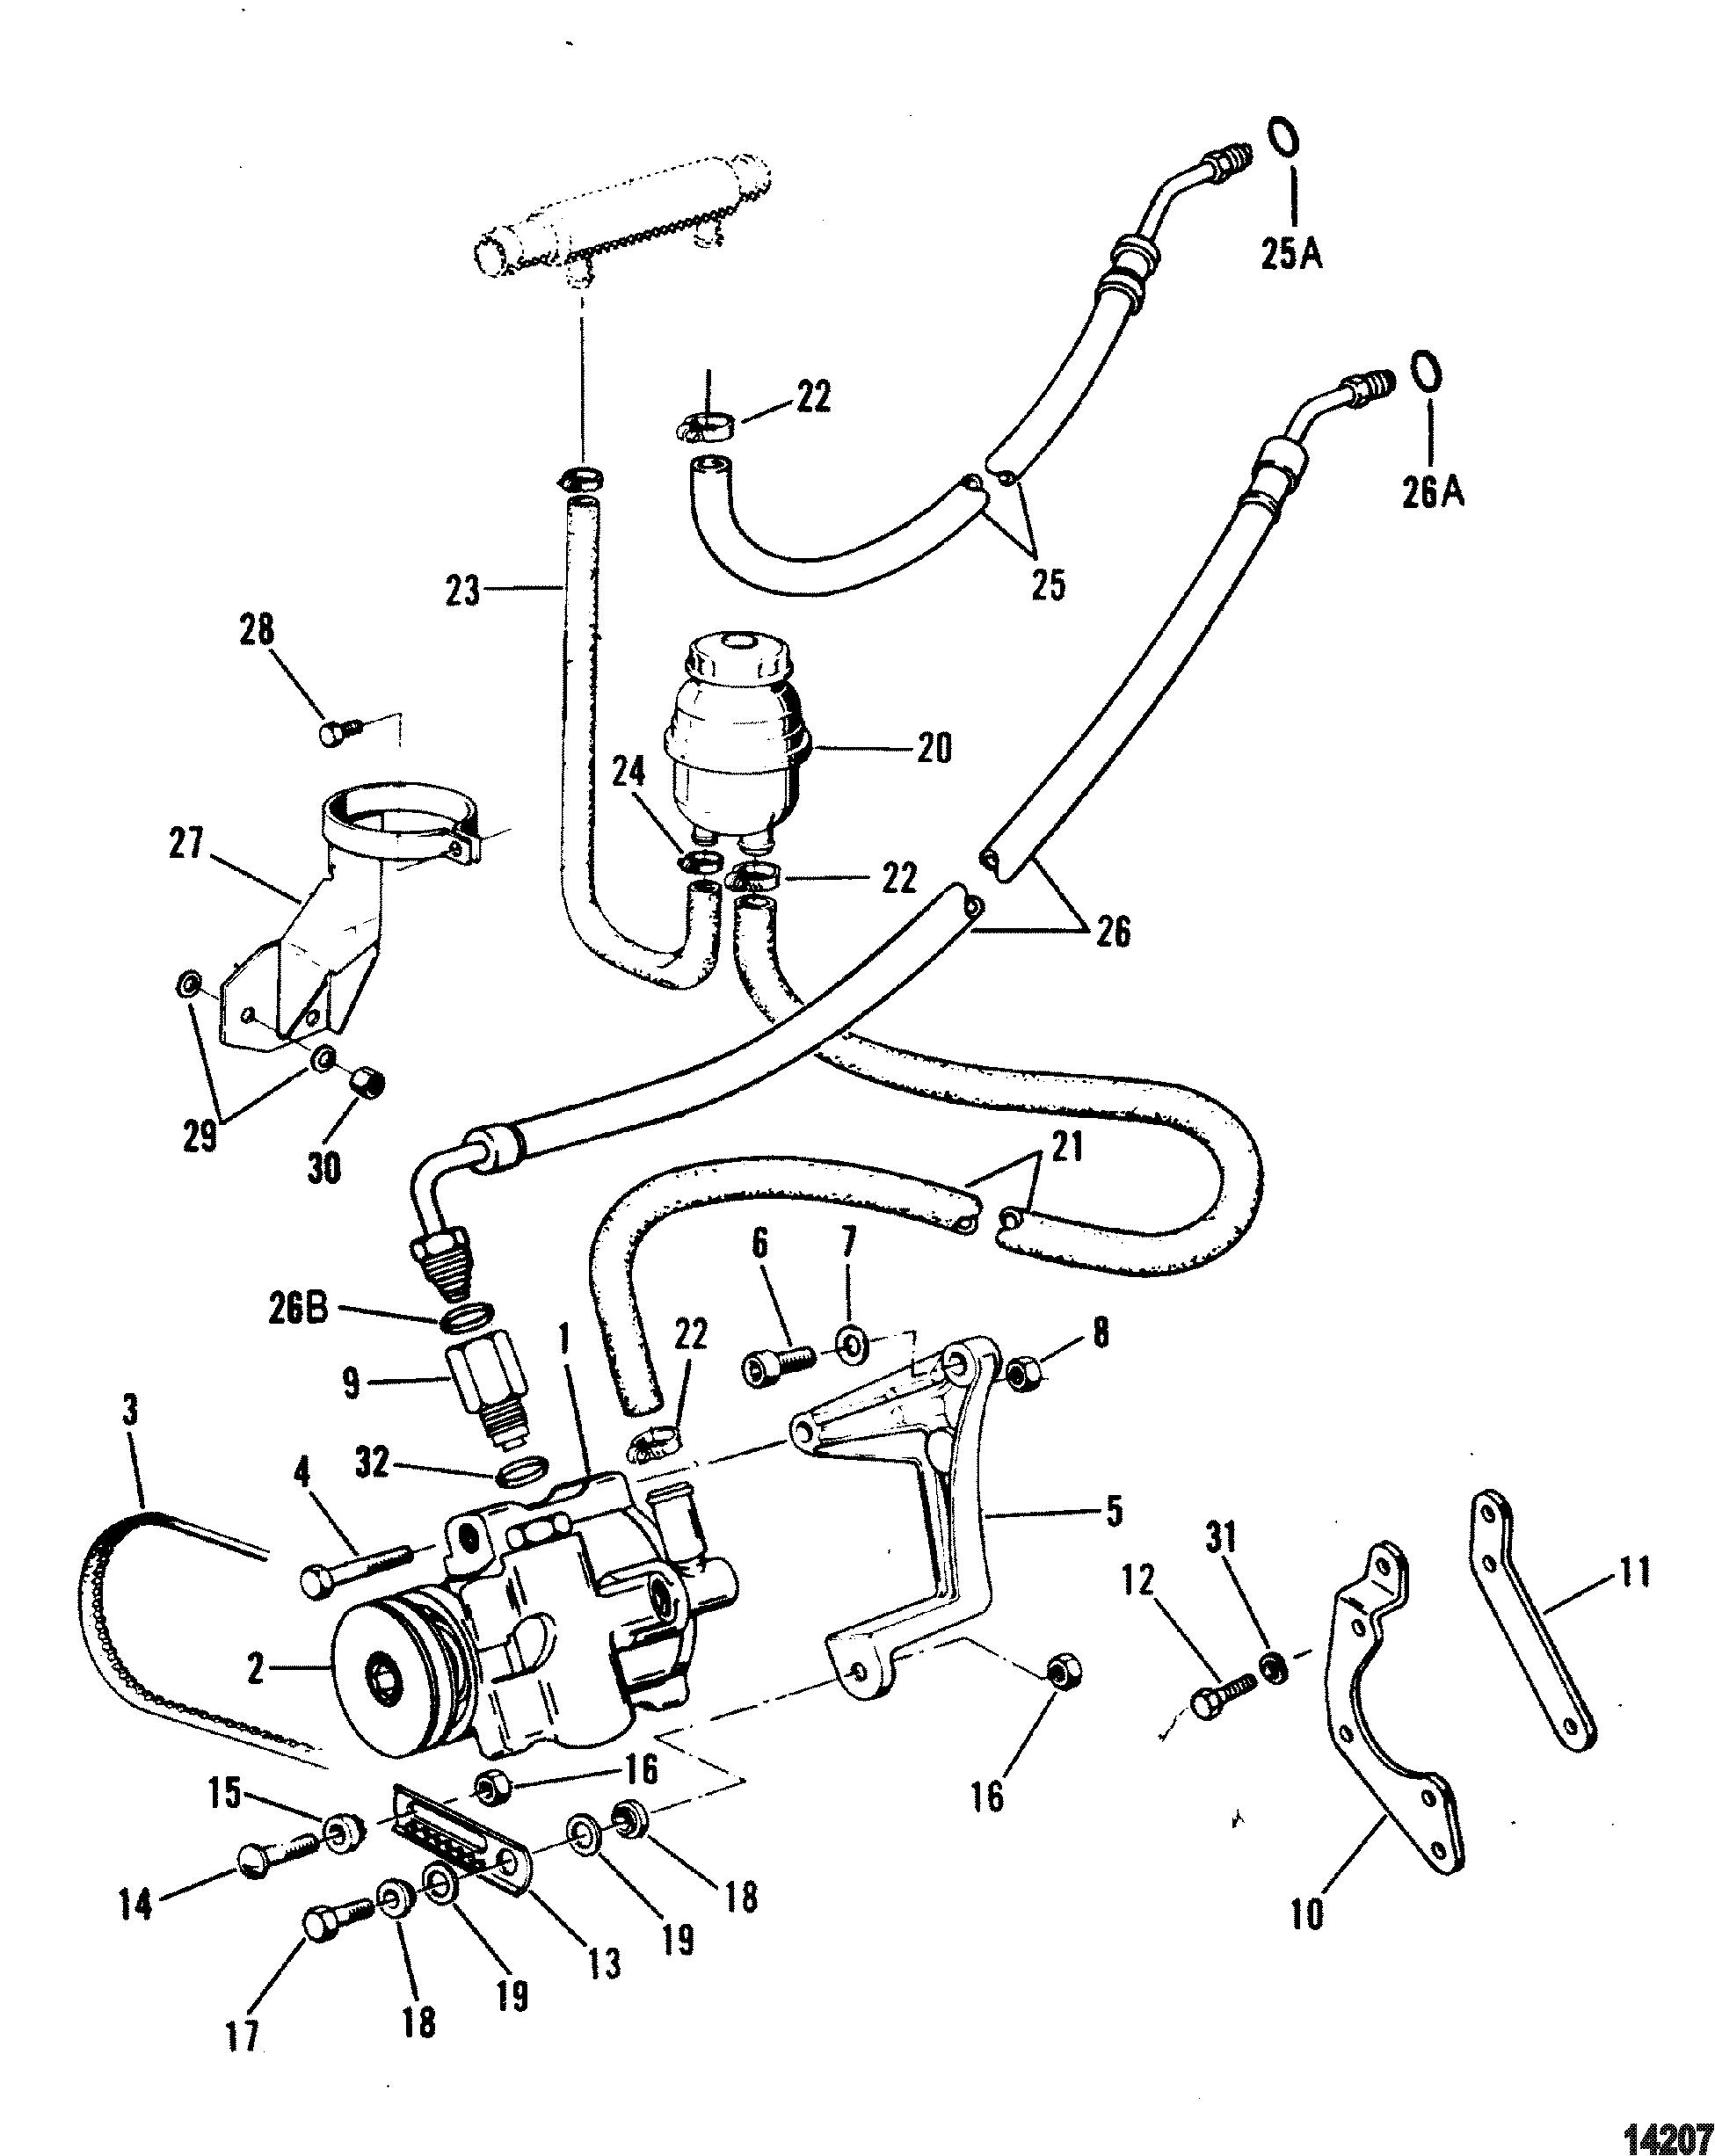 Peugeot Cabriolet Fuse Box Diagram Wiring. Peugeot. Auto